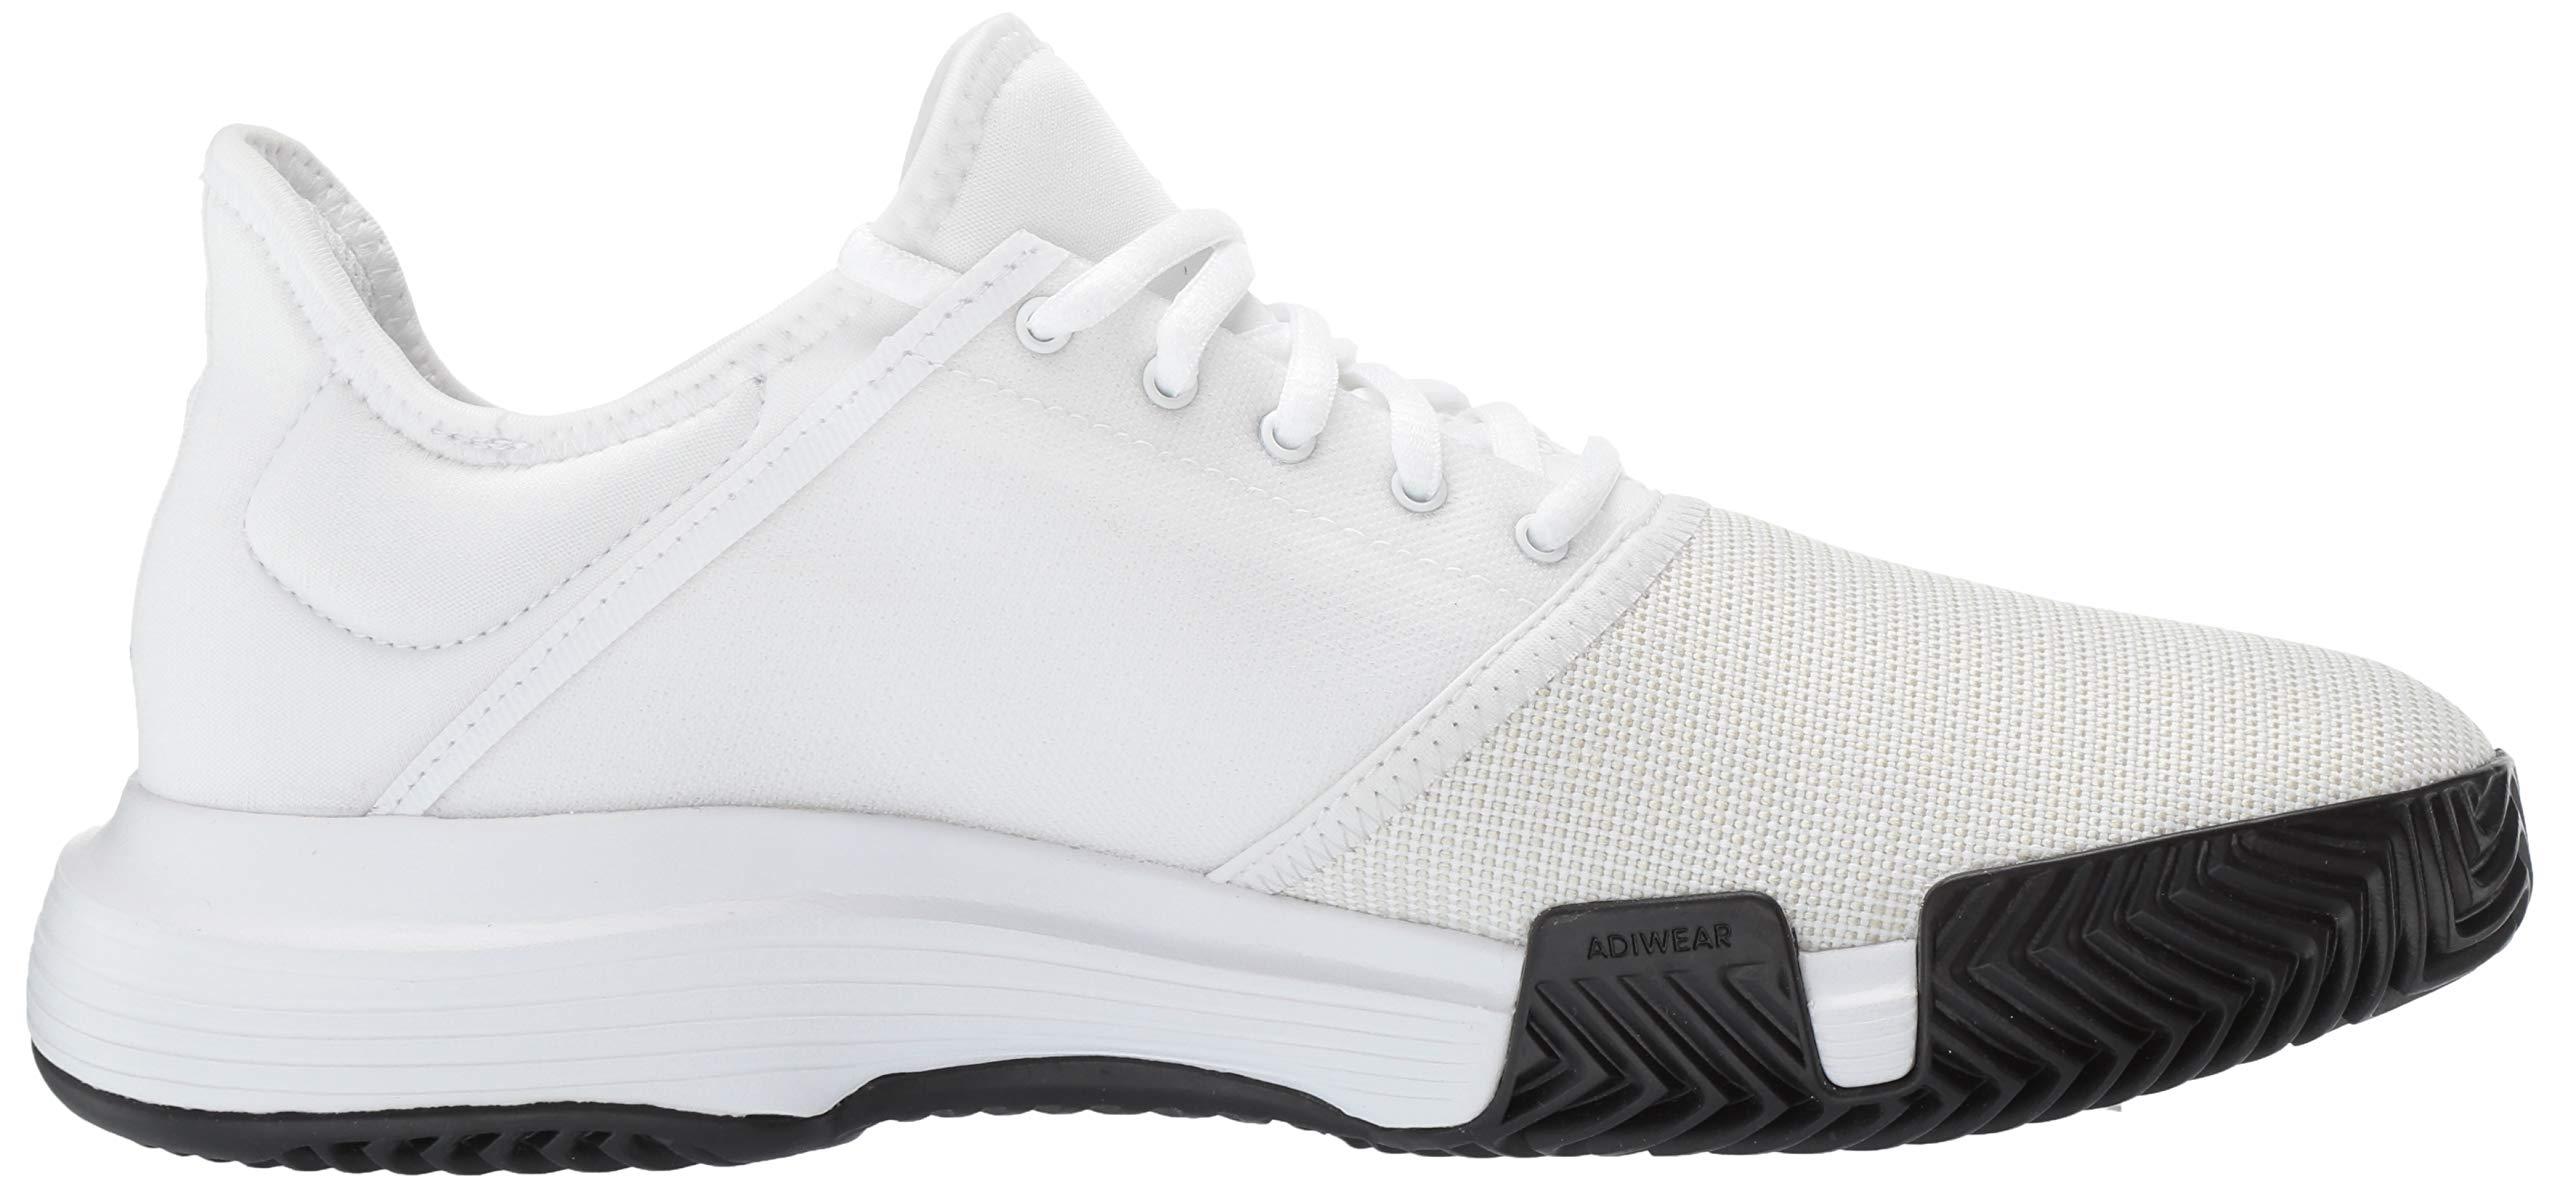 adidas Men's Gamecourt, White/Matte Silver/Black, 7.5 M US by adidas (Image #10)